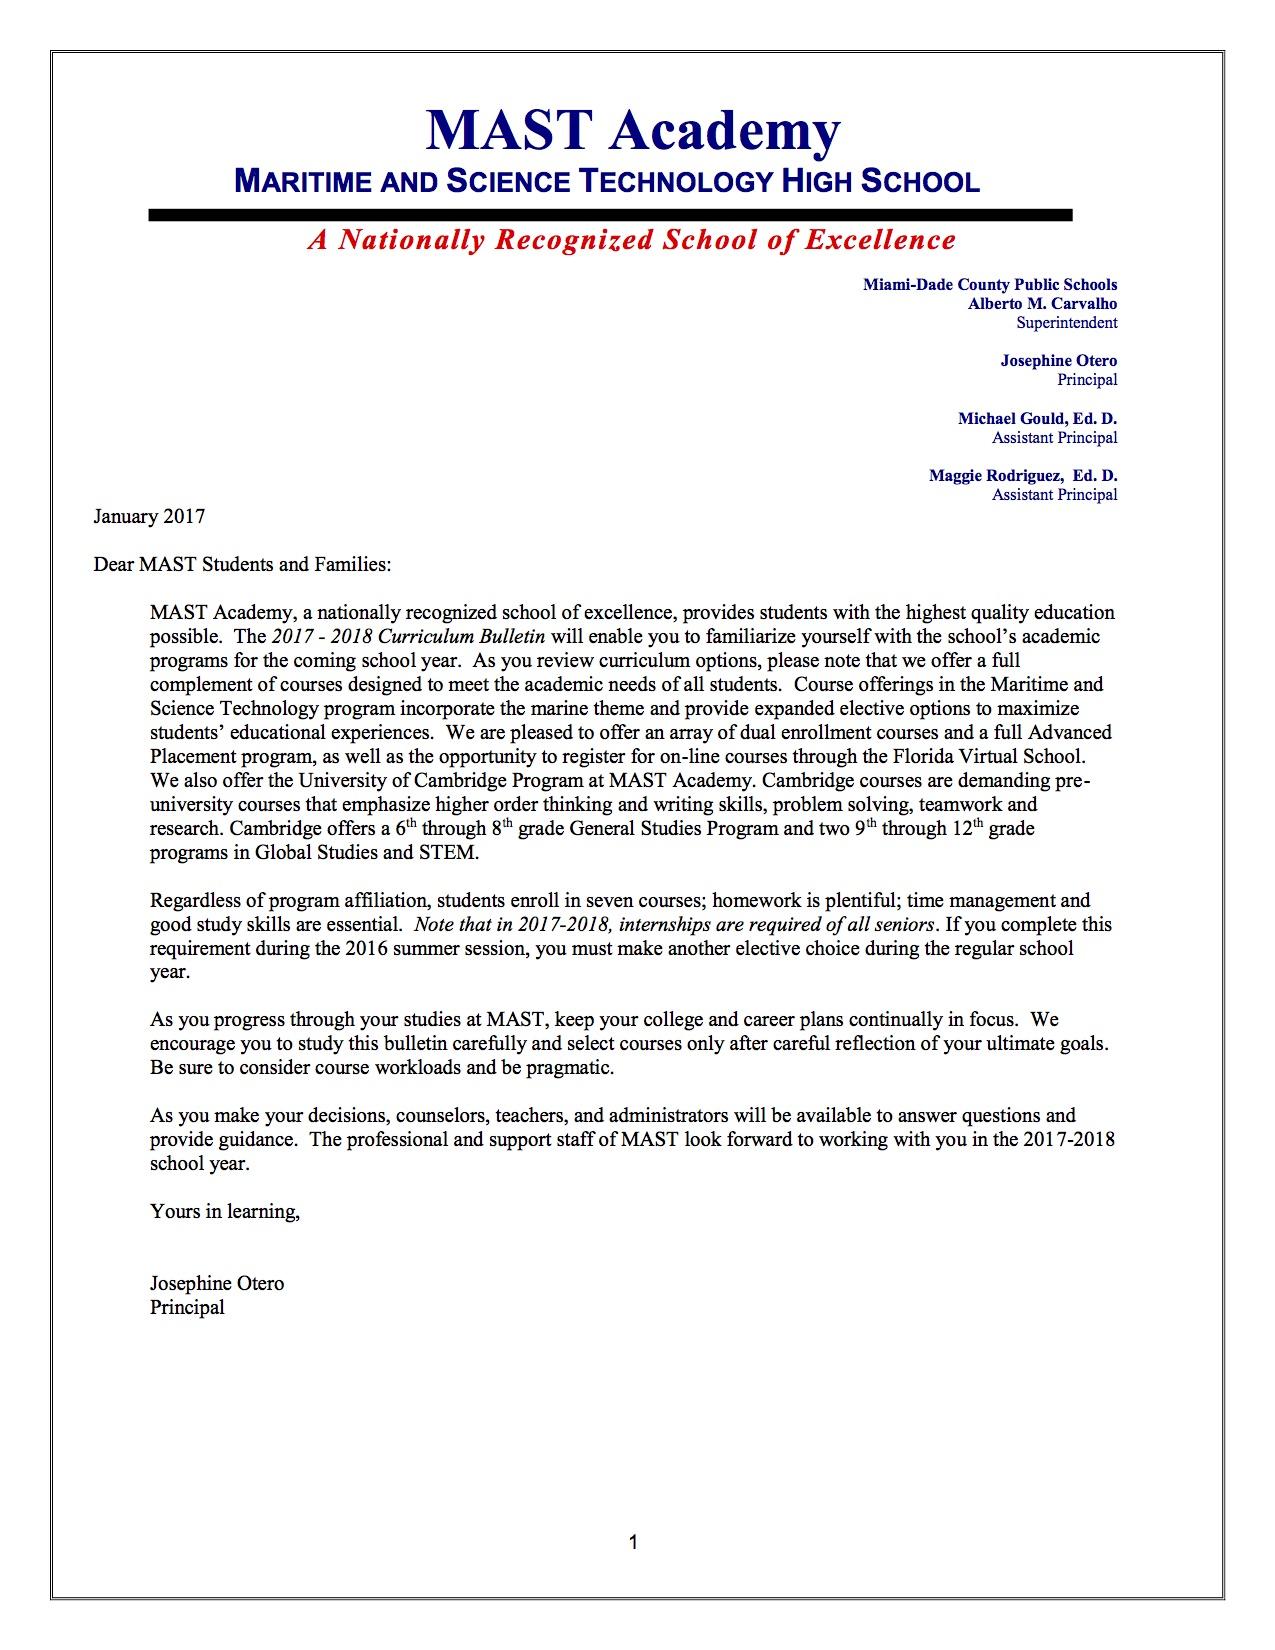 Curriculumbulletin2017 18g curriculum bulletin 1betcityfo Image collections